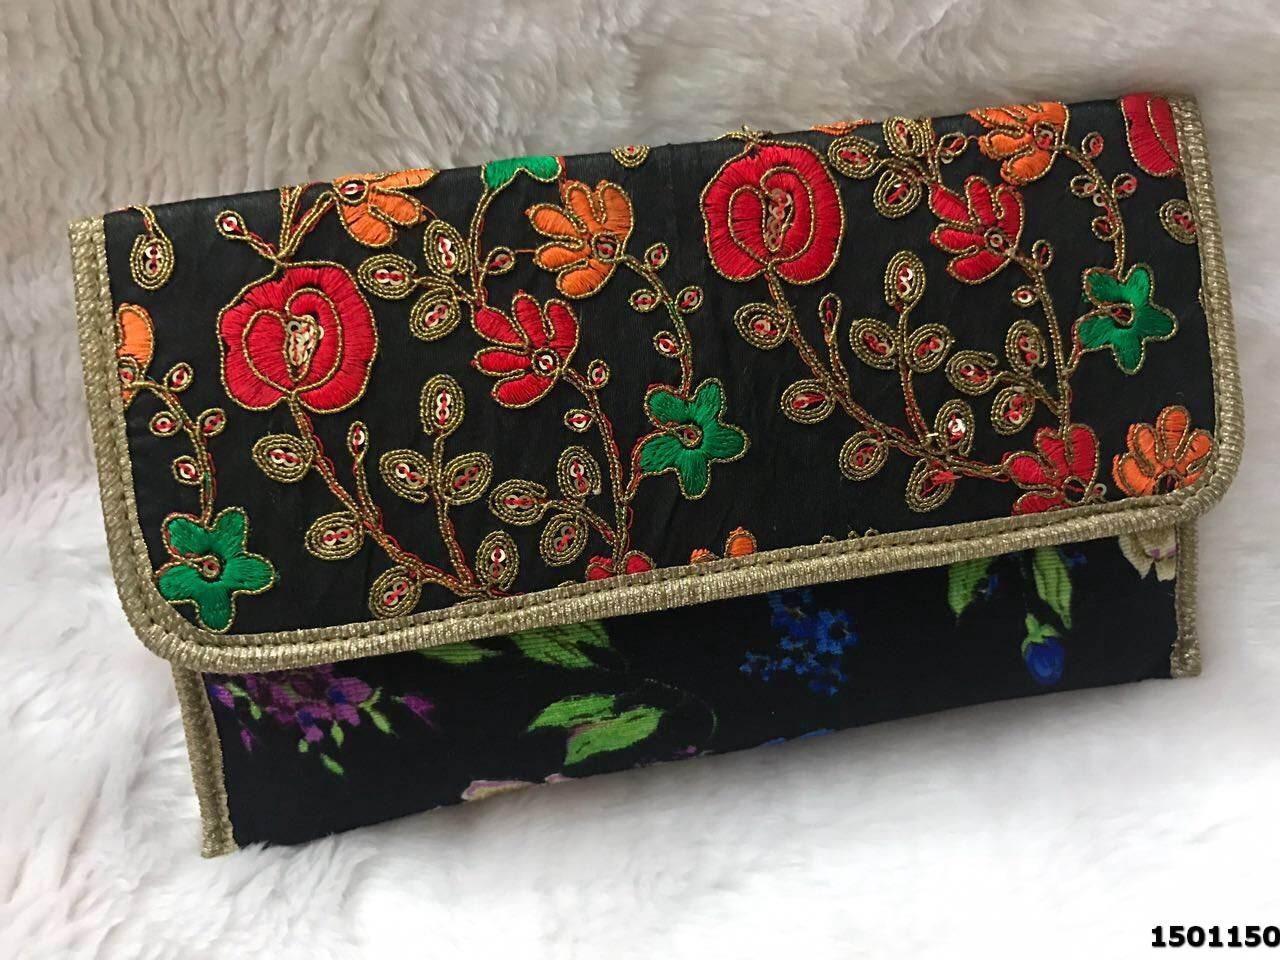 Fabulous Colorful Clutch Bag